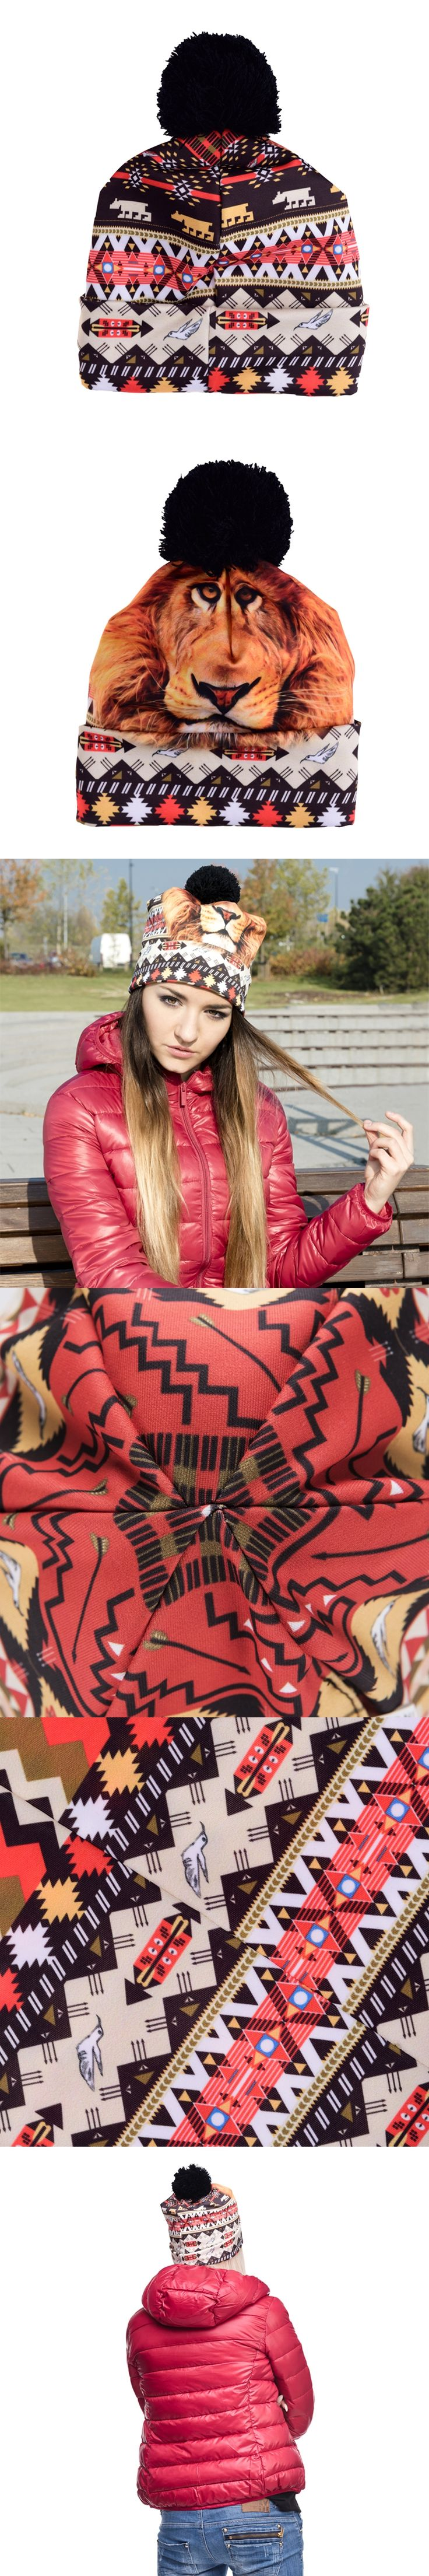 Hot Sale 3D Full Print Beanie Hat Women Man Aztec Peru Lion Autumn Winter Cap Bobble Pompon Knitted Christmas Hats Gift